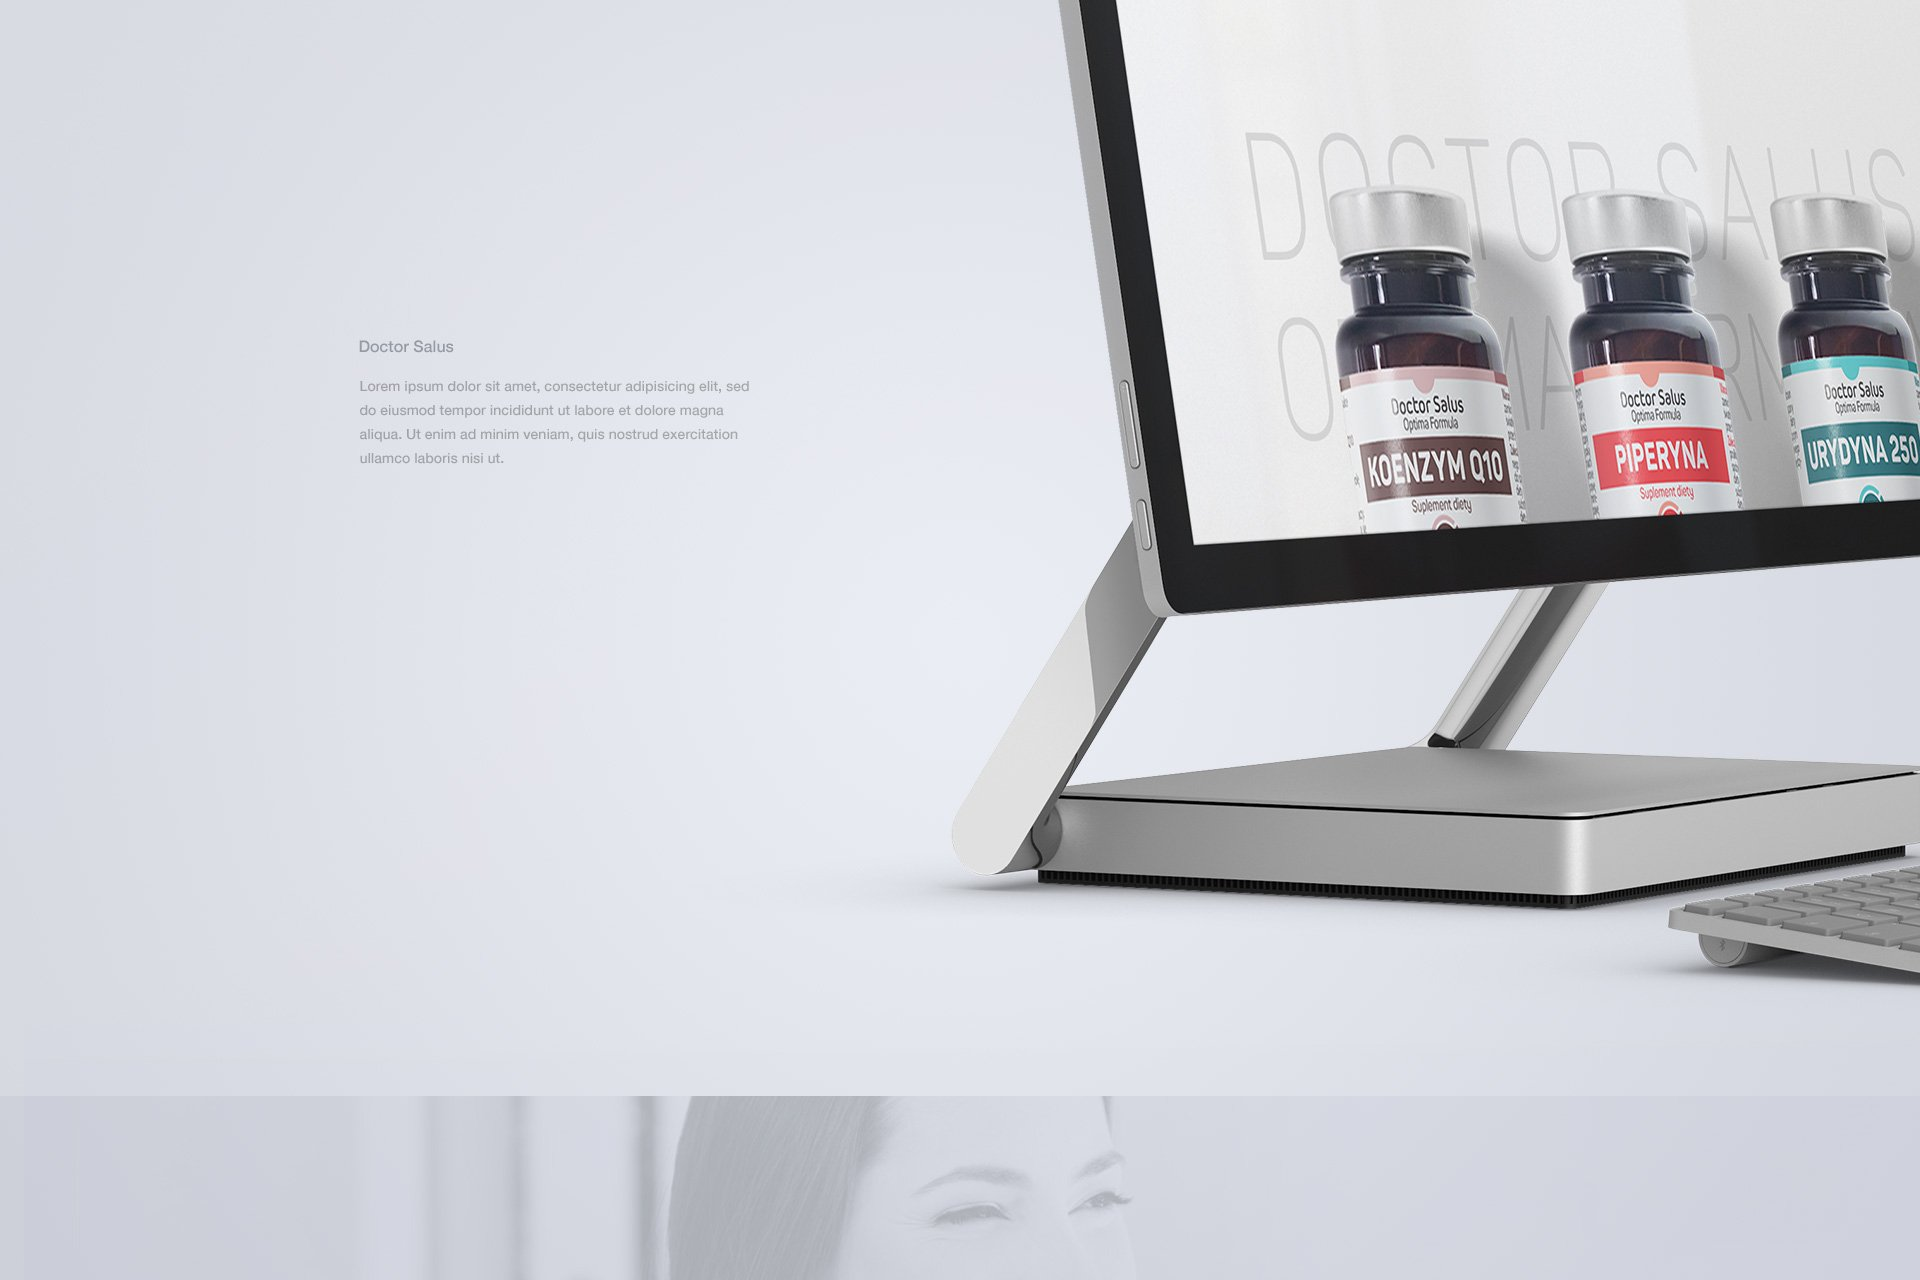 strona internetowa z suplementami diety